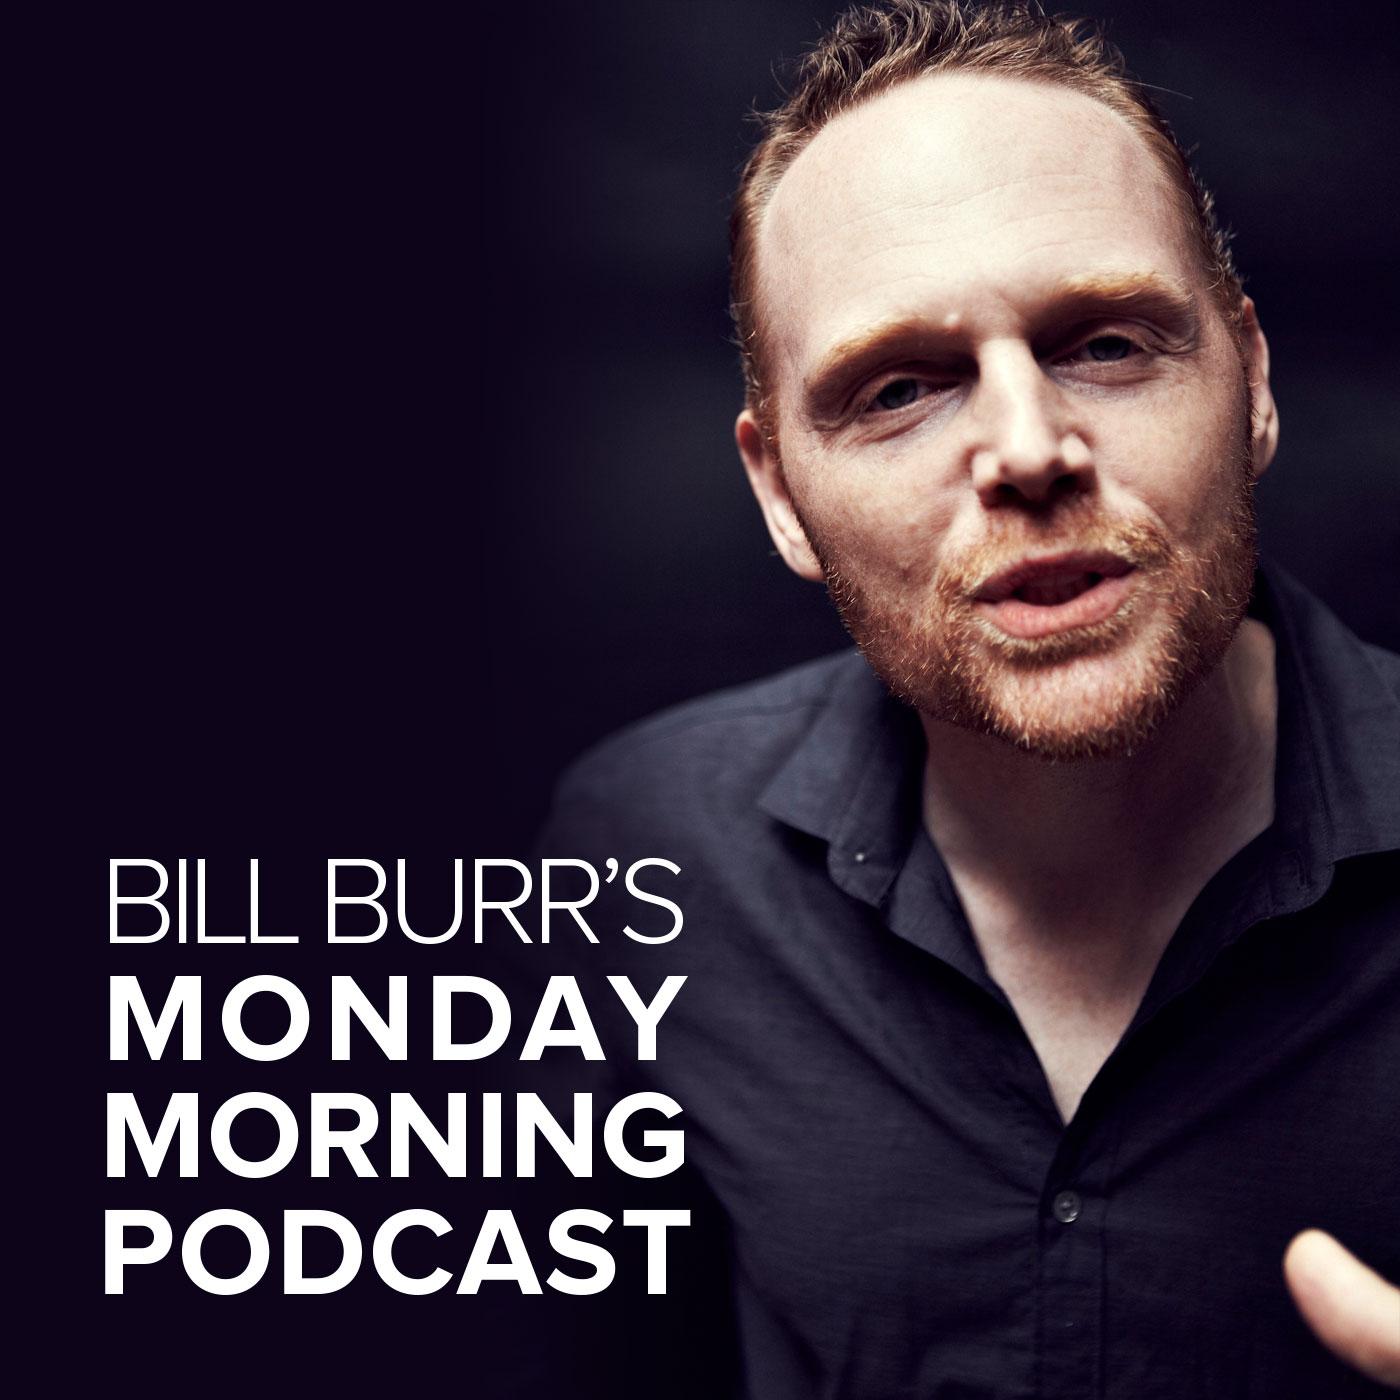 Artwork for Monday Morning Podcast 9-9-19